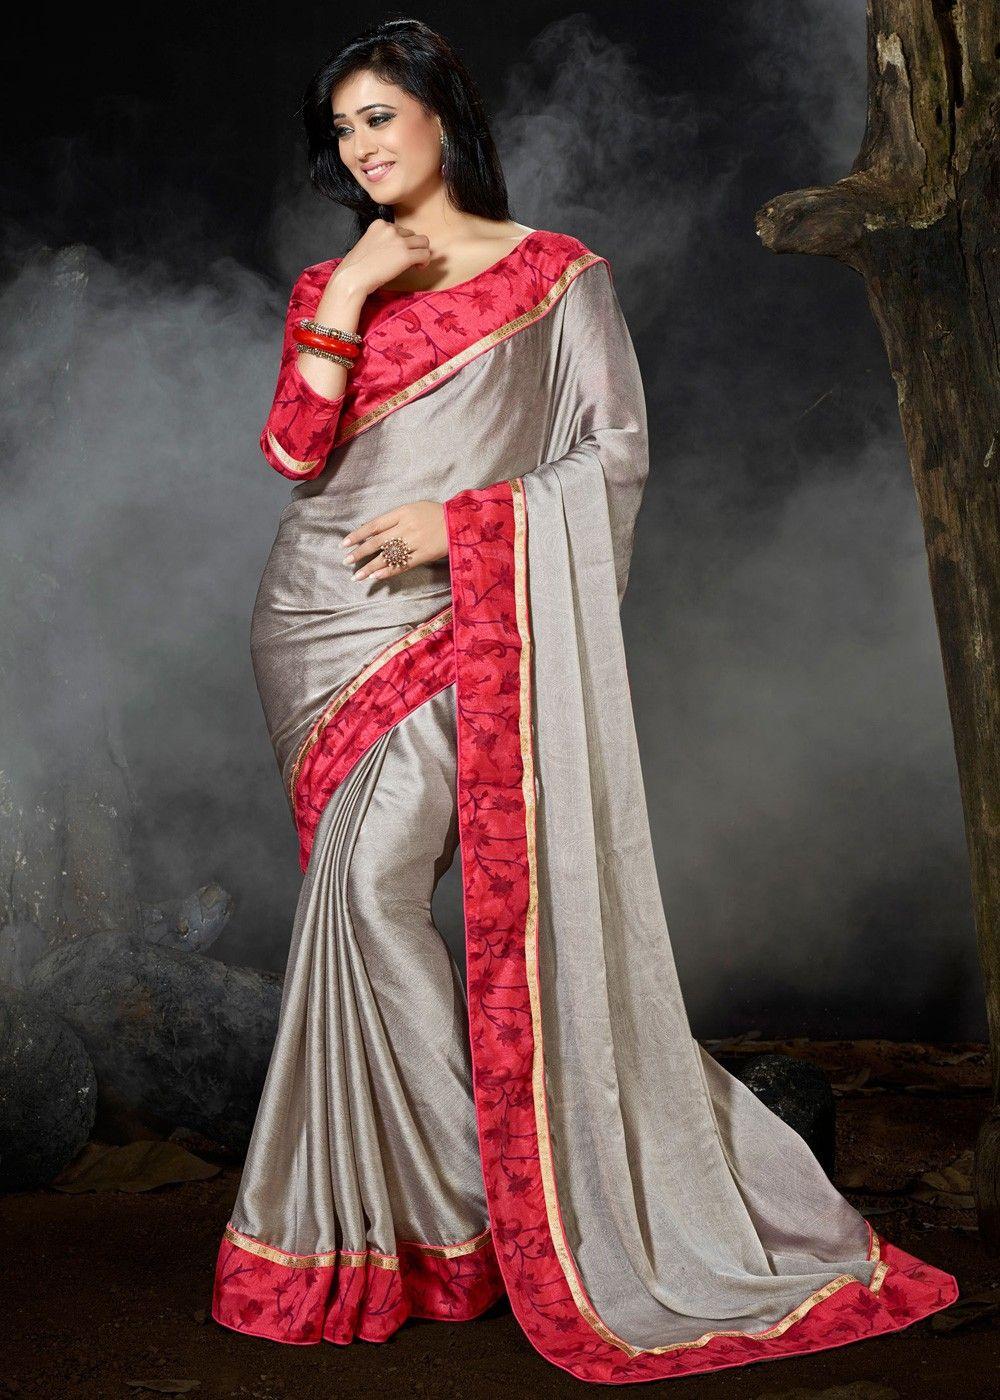 Details about  / Sari Printed Bollywood Georrgte Designer Soft Saree Party wear wedding Saree SS